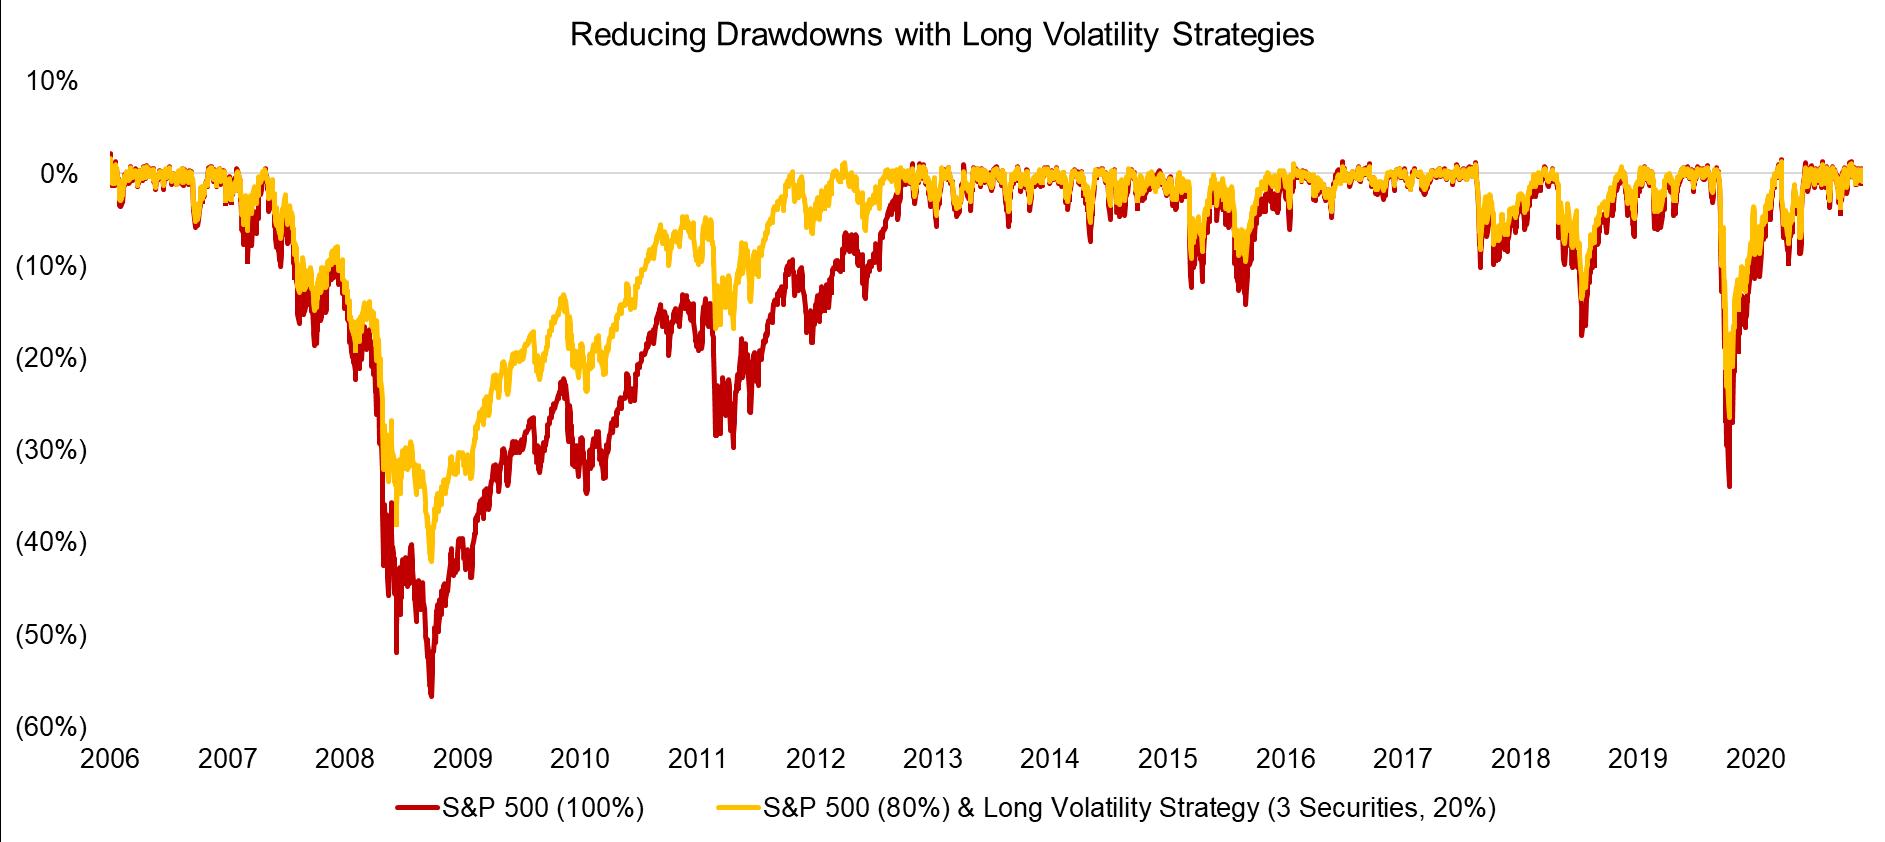 Reducing Drawdowns with Long Volatility Strategies